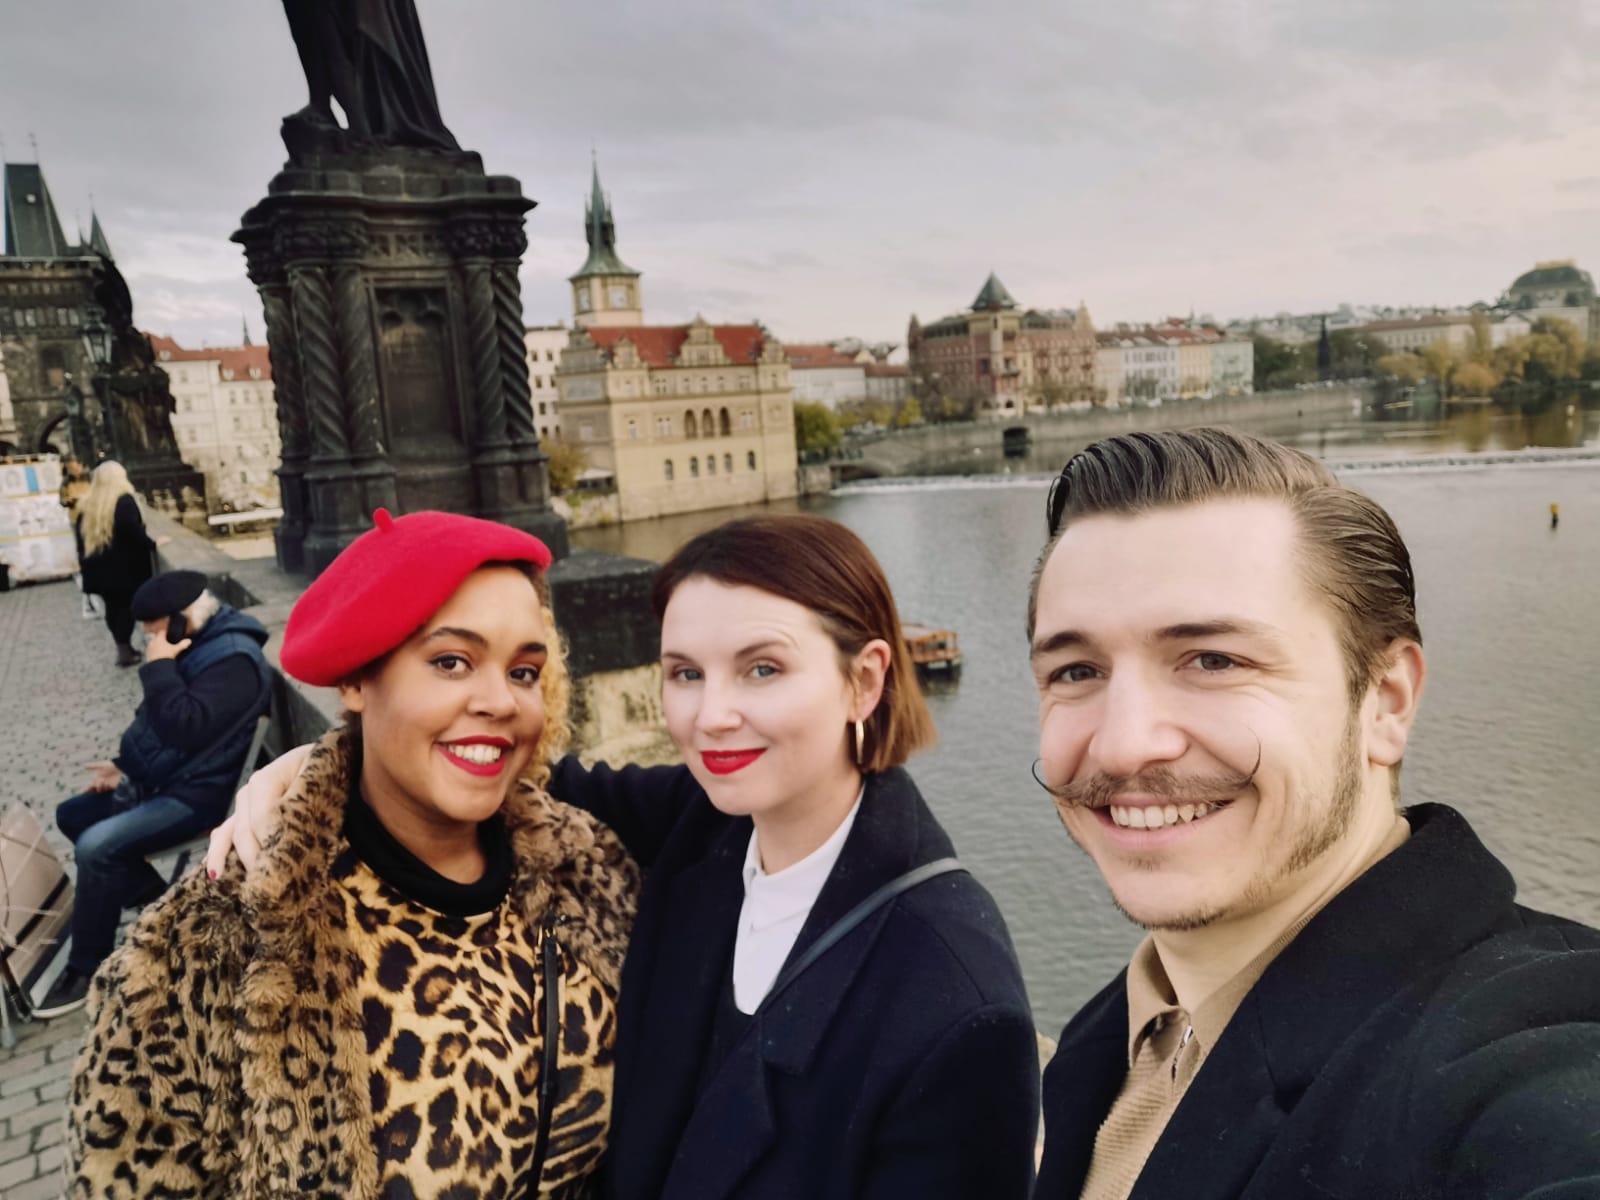 Medbelle Team Spirit - Chloe, Sarah & Sebi on Medbelle Trip to Köln